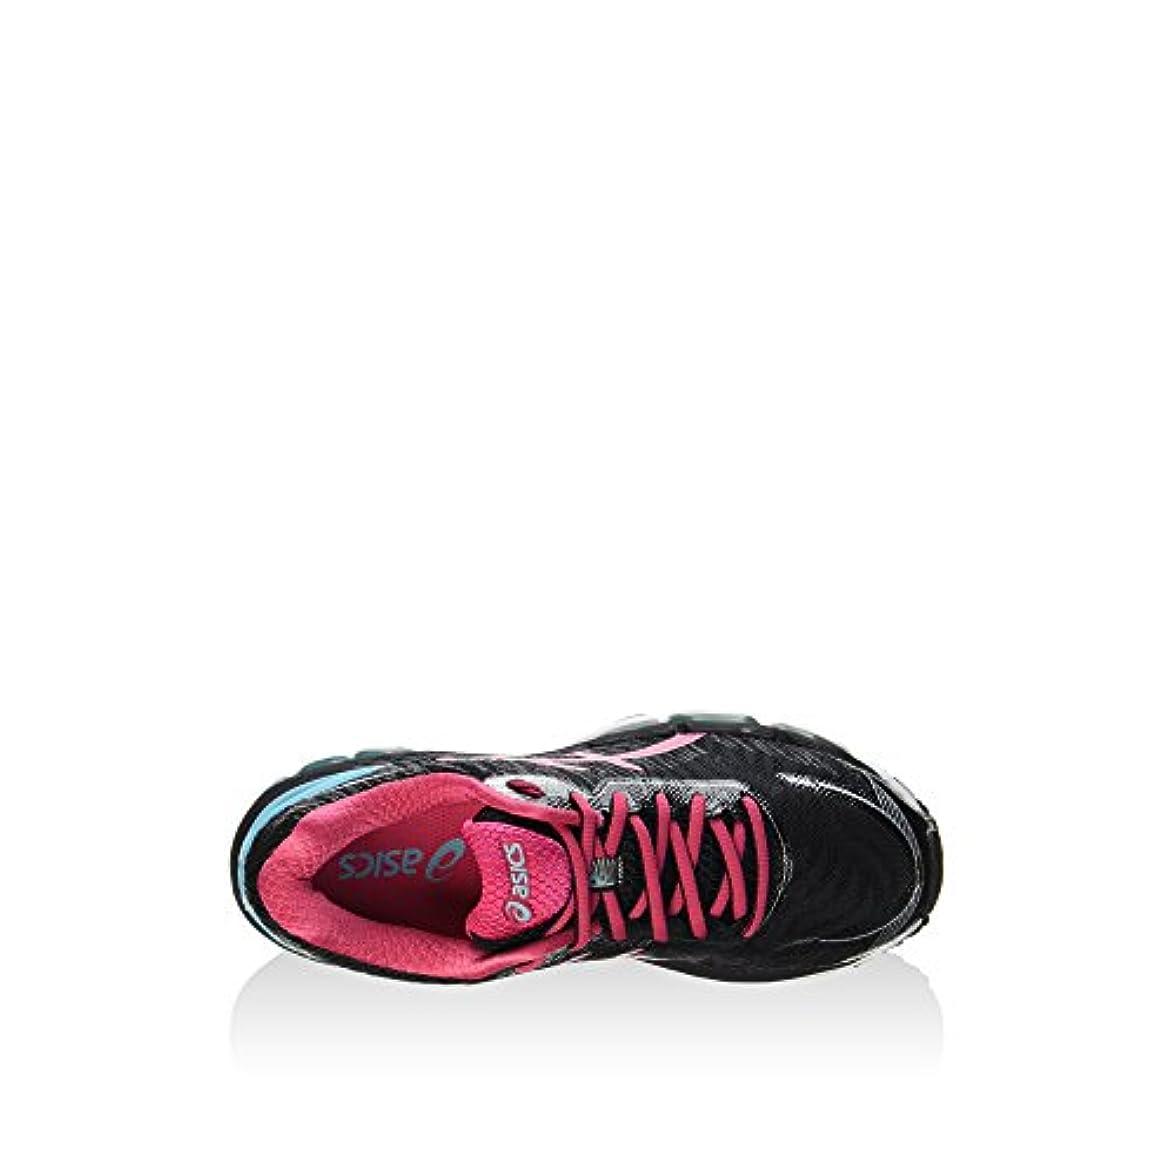 Asics - Gel-glorify 2 Sneaker Donna